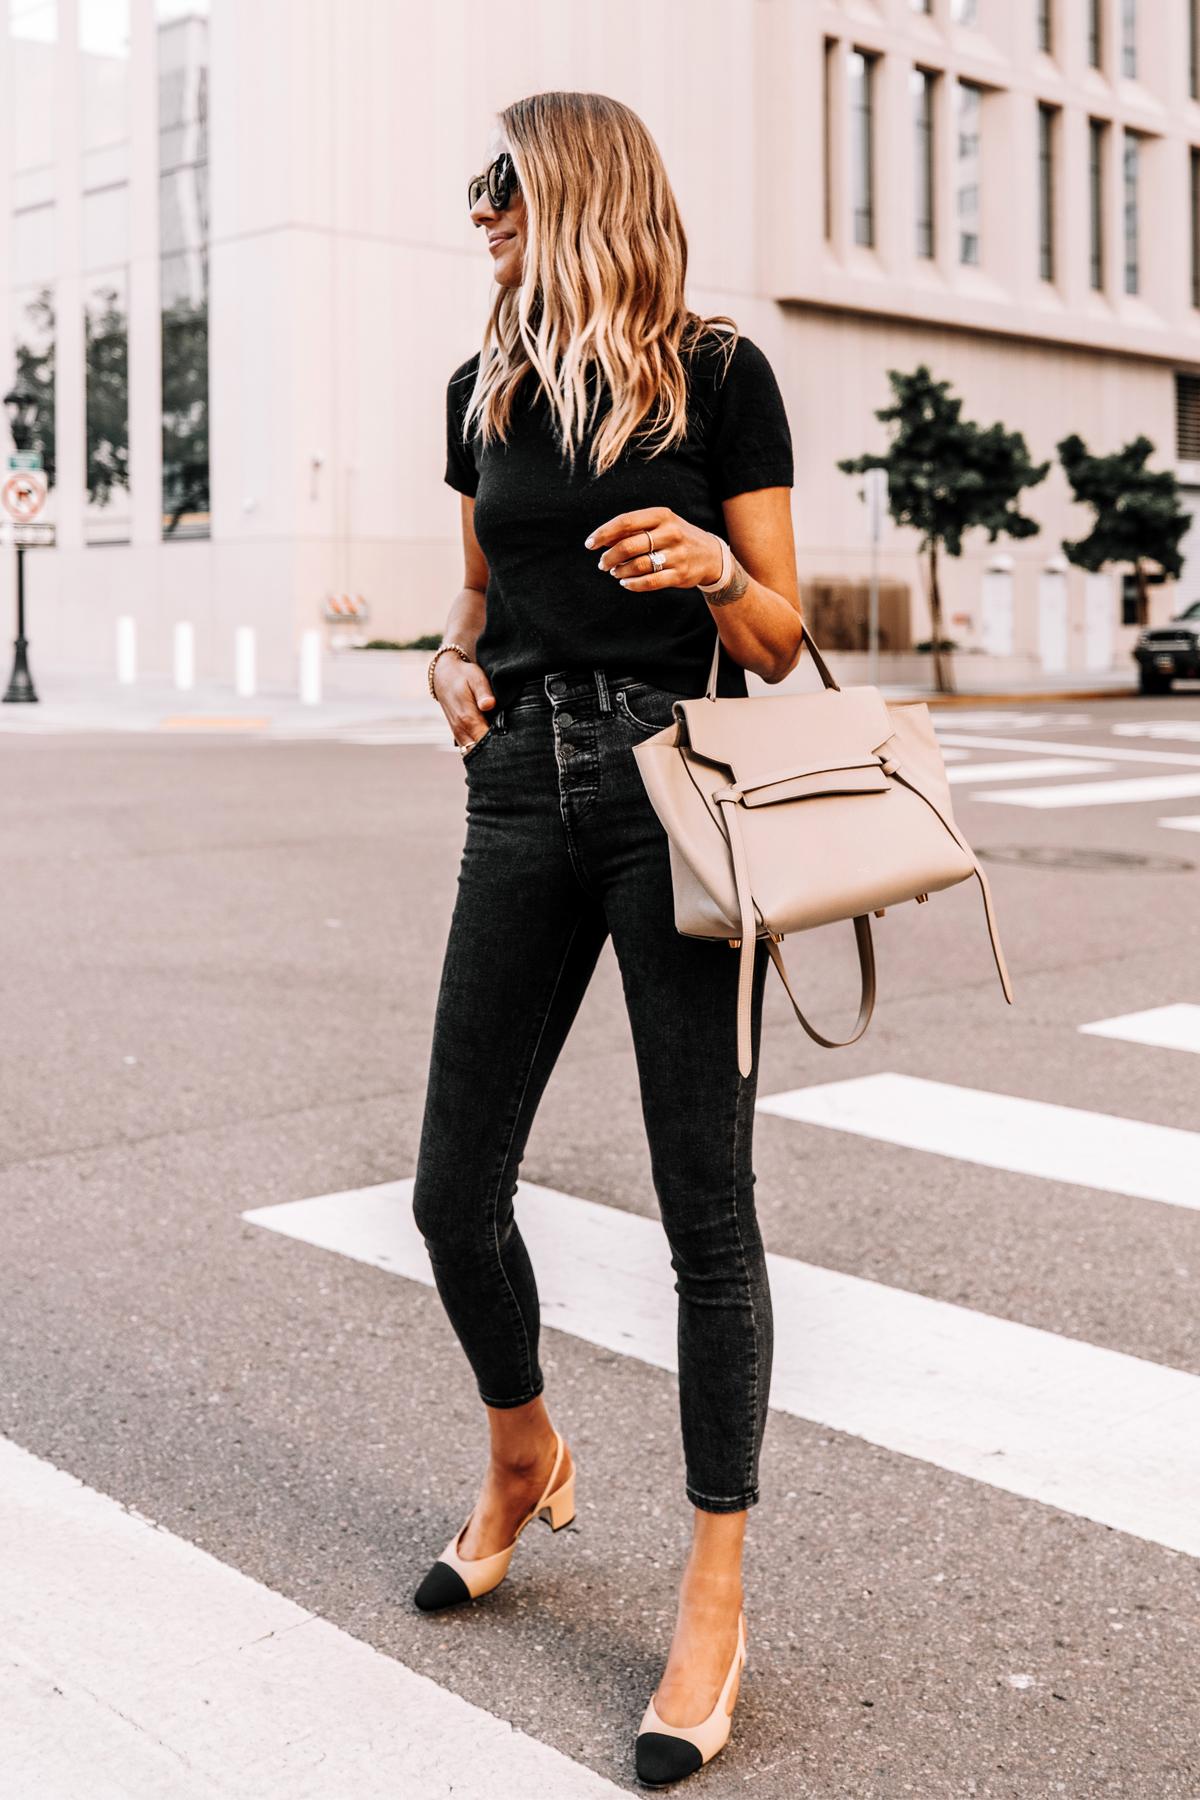 Fashion Jackson Wearing Everlane Black Short Sleeve Sweater Everlane Black Skinny Jeans Chanel Slingbacks Celine Belt Bag 1